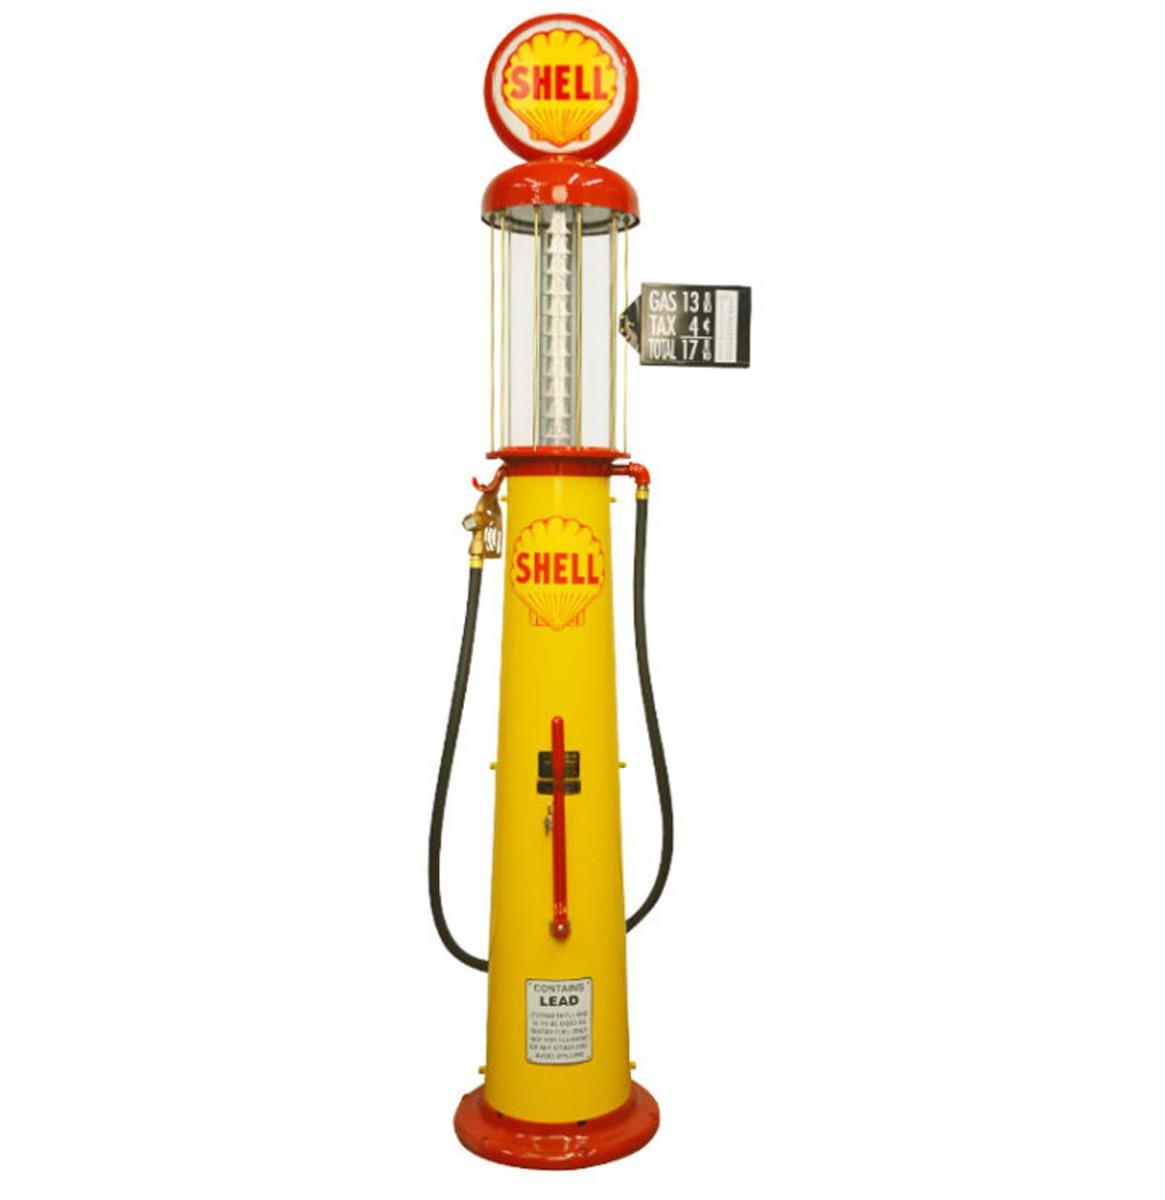 Wayne 615 Shell 10 Gallon Benzinepomp - Geel & Rood - Reproductie